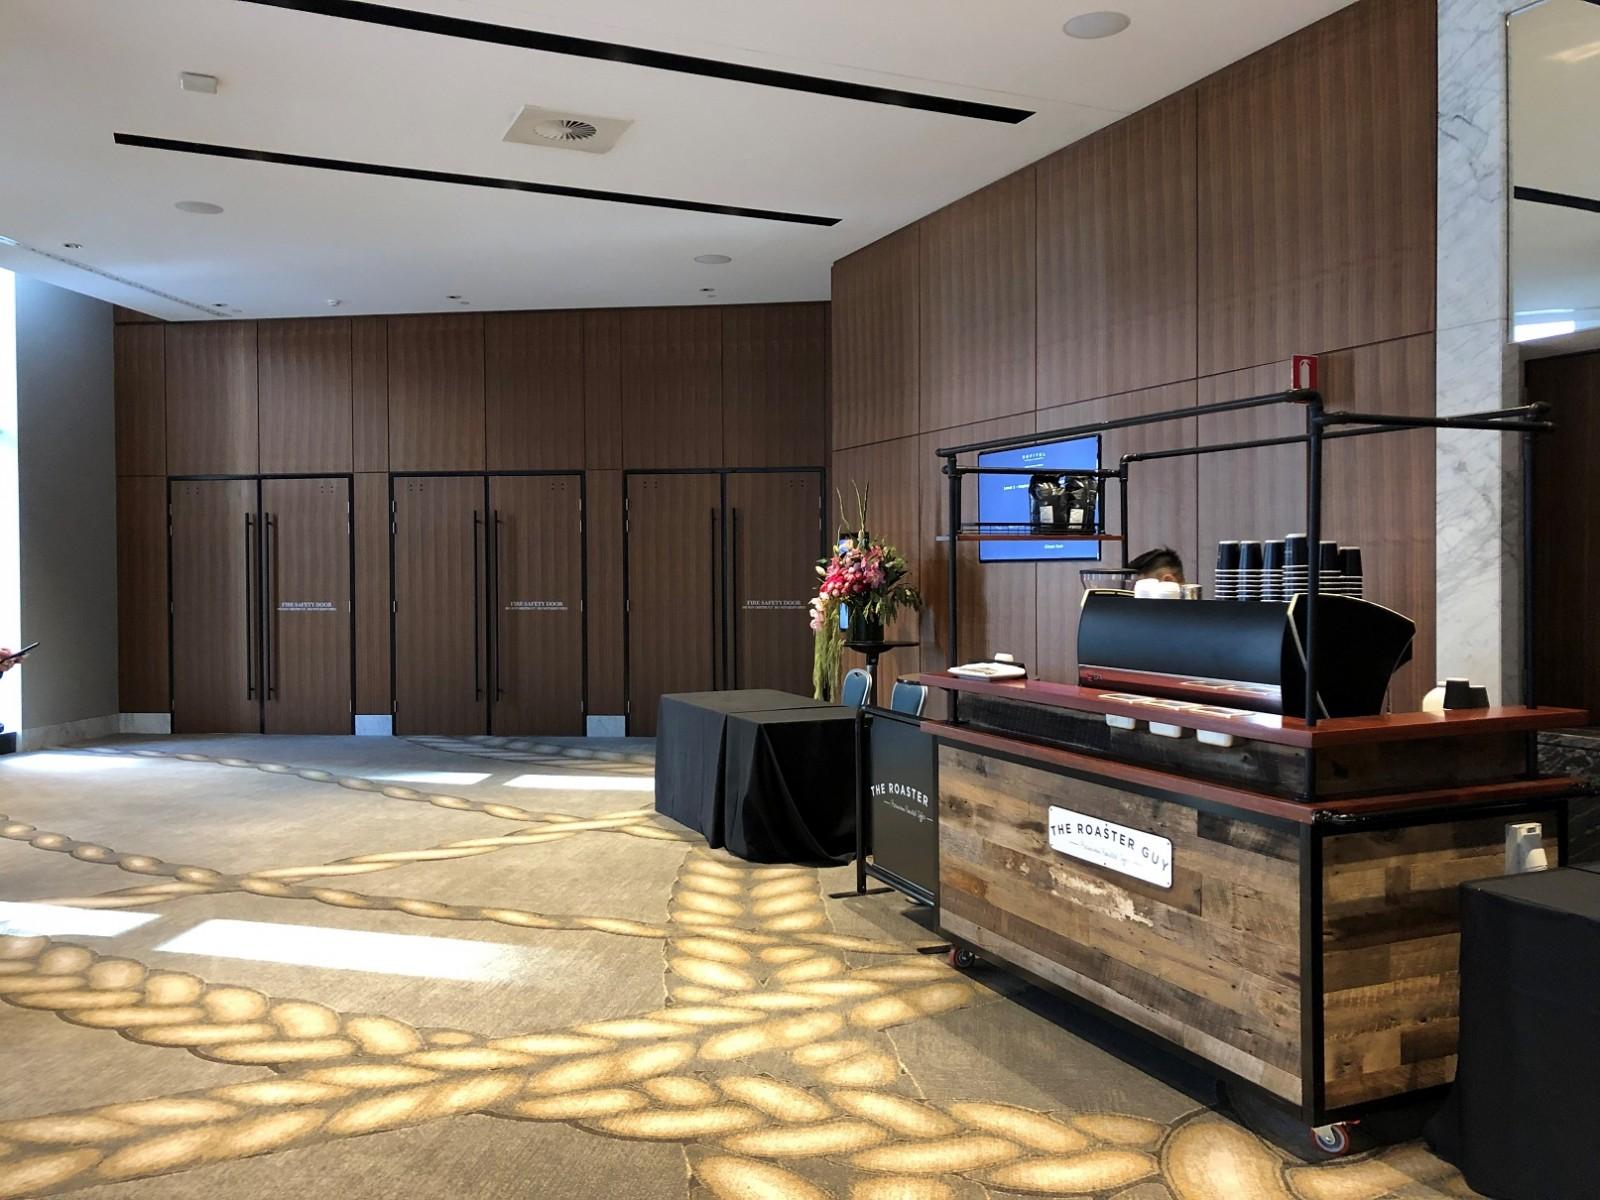 Ballroom-Registration-desk-and-coffee-cart.jpg